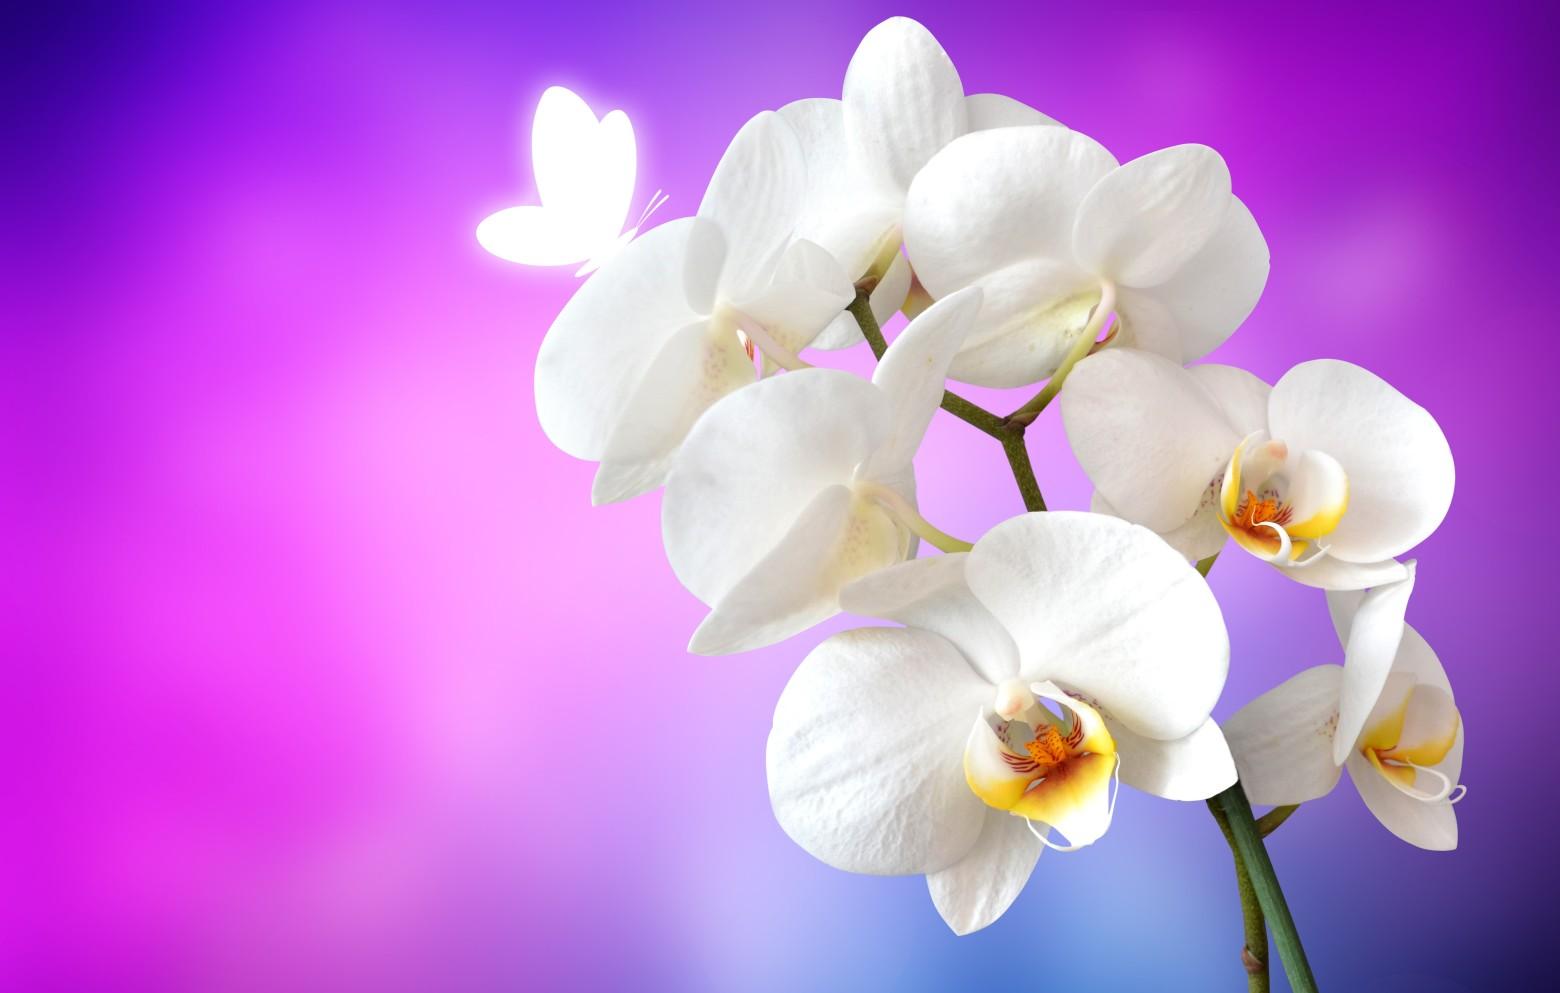 Fond D Ecran Gratuit Orchidee Zen